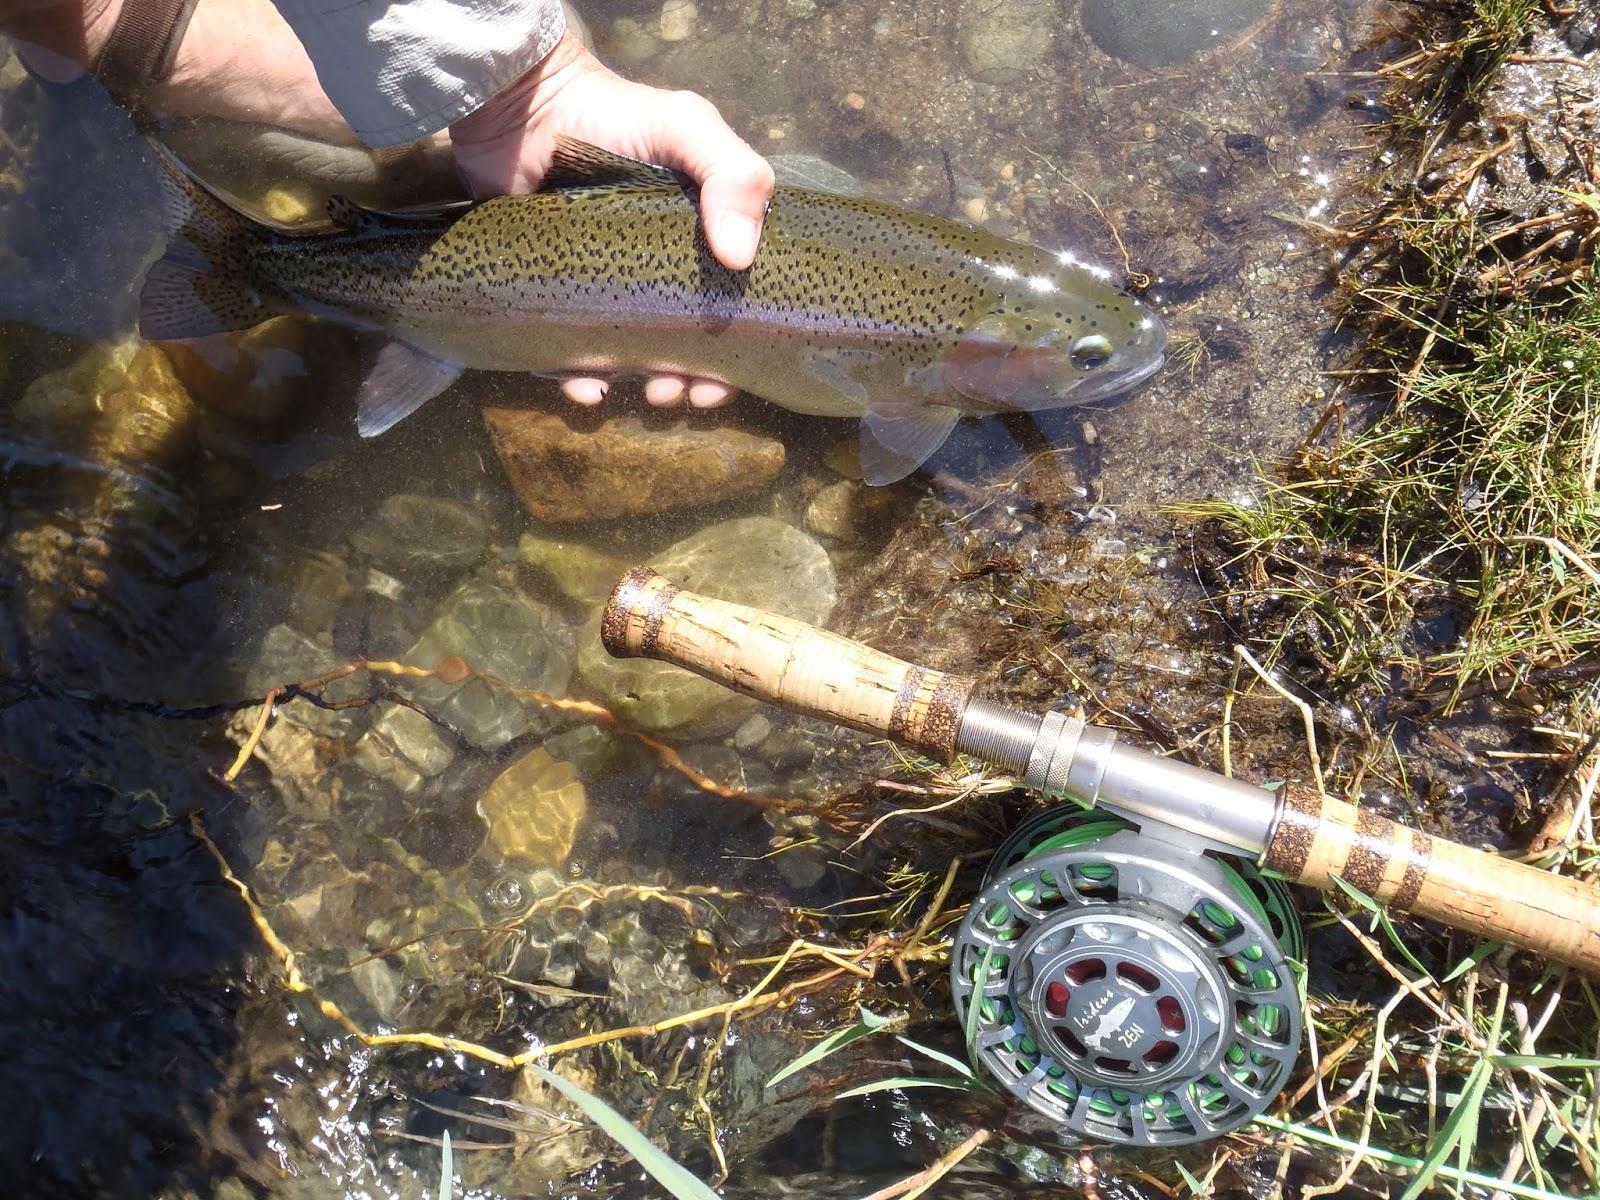 Irideus fly fishing products california steelhead season for Steelhead fishing gear